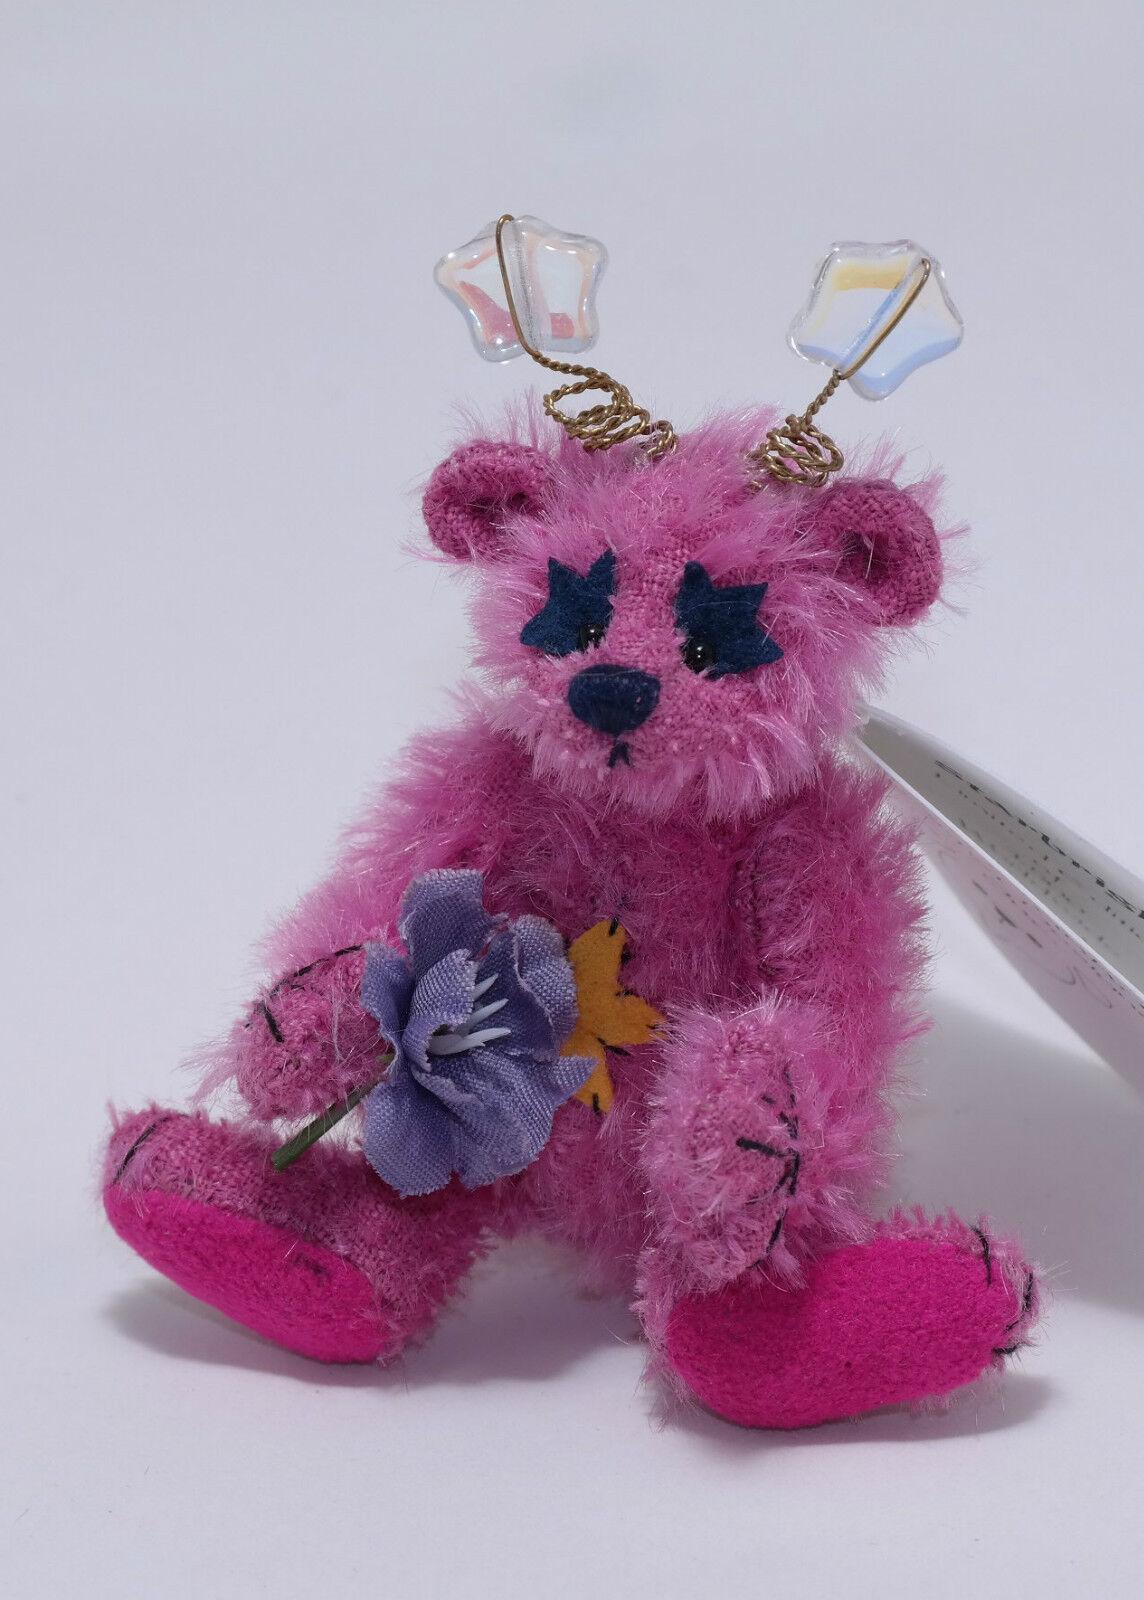 DEB Canham * in miniatura Teddy Bear starbright-LTD ED 752 *